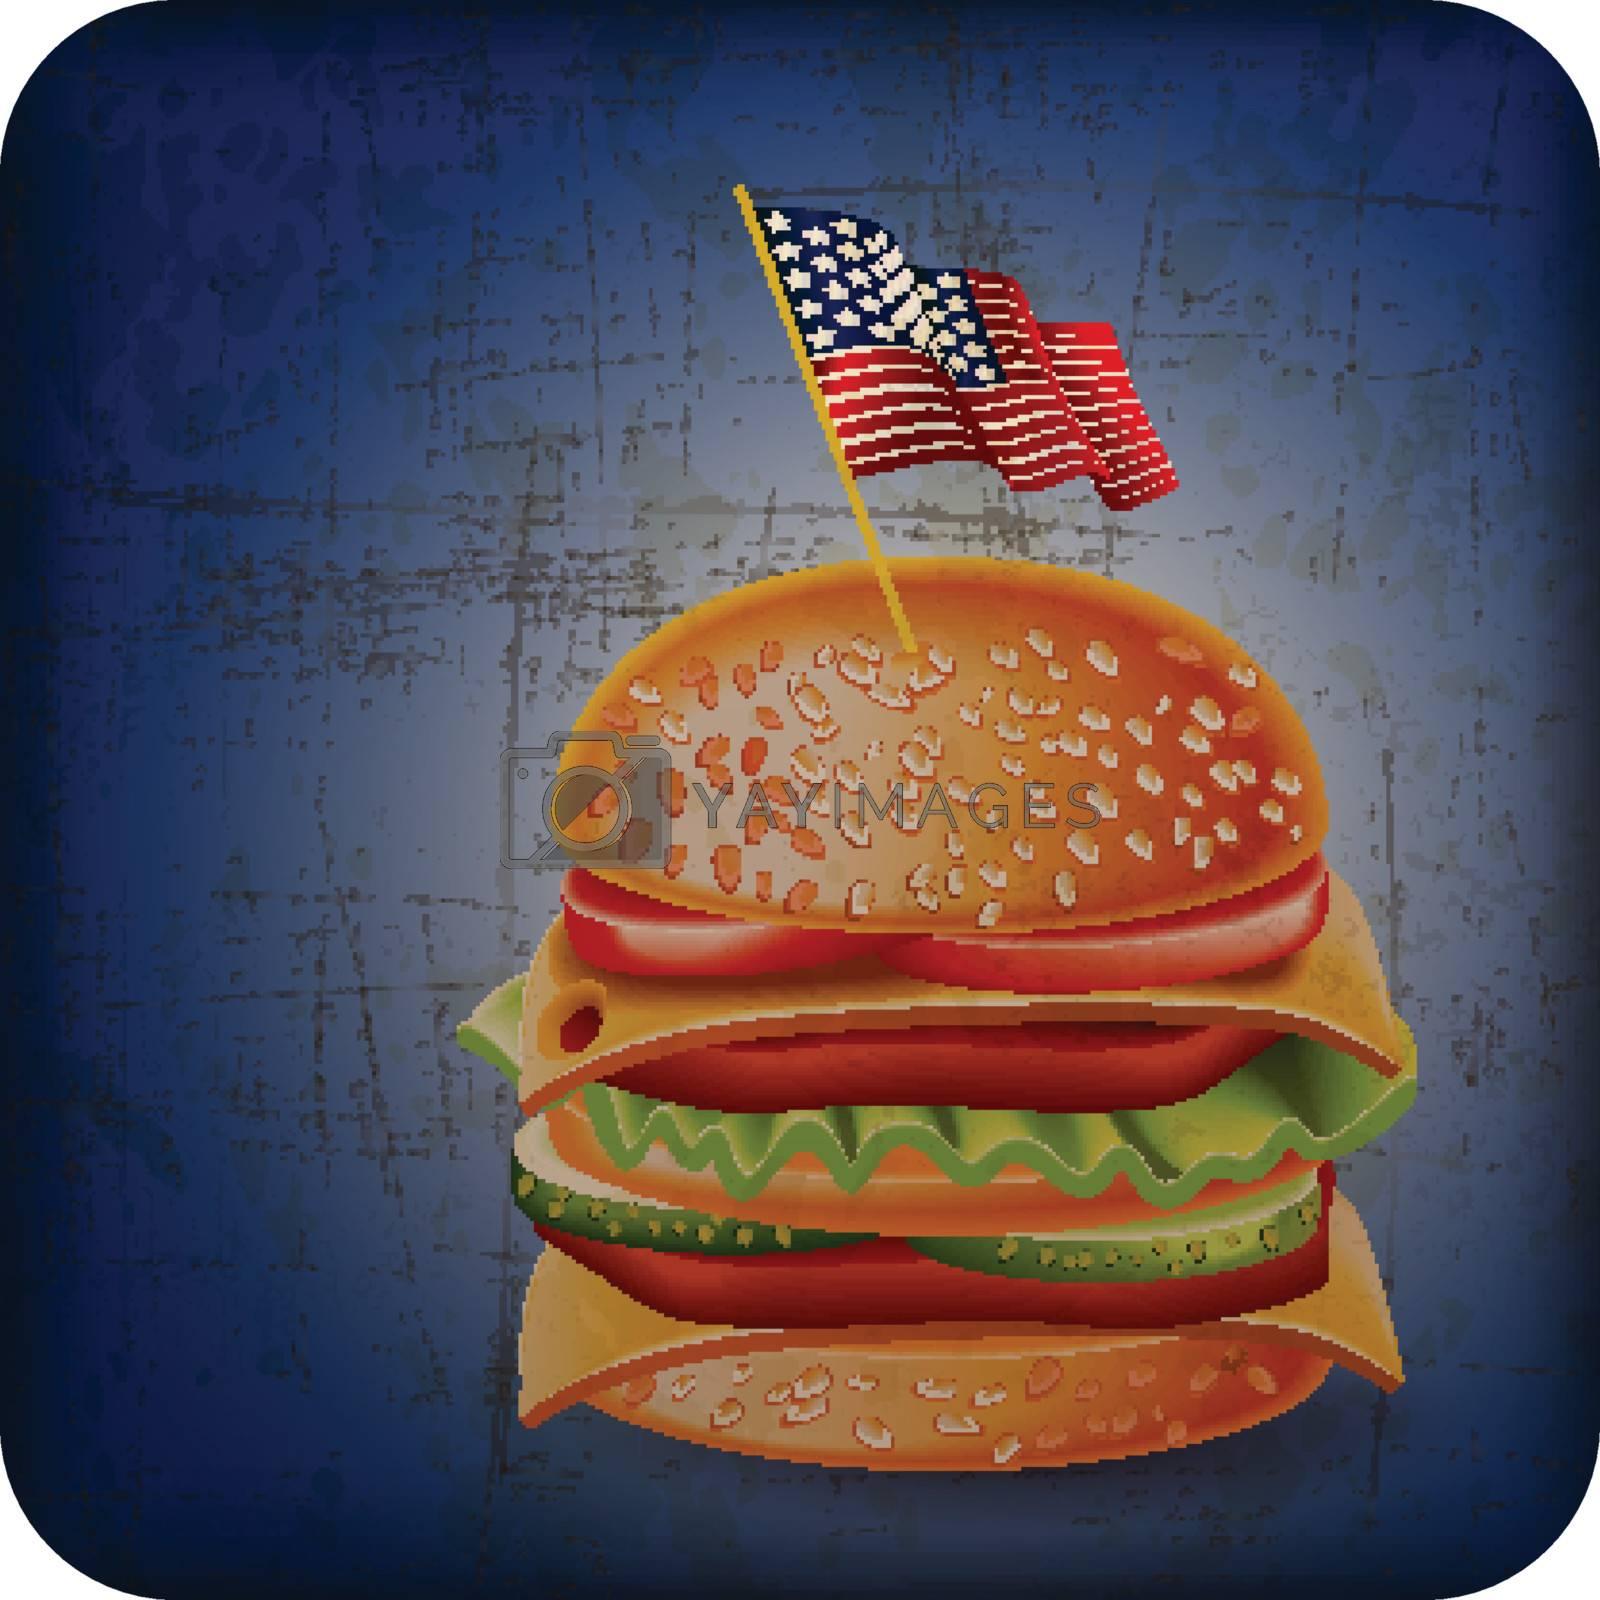 vintage USA hamburger with Grunge Effect